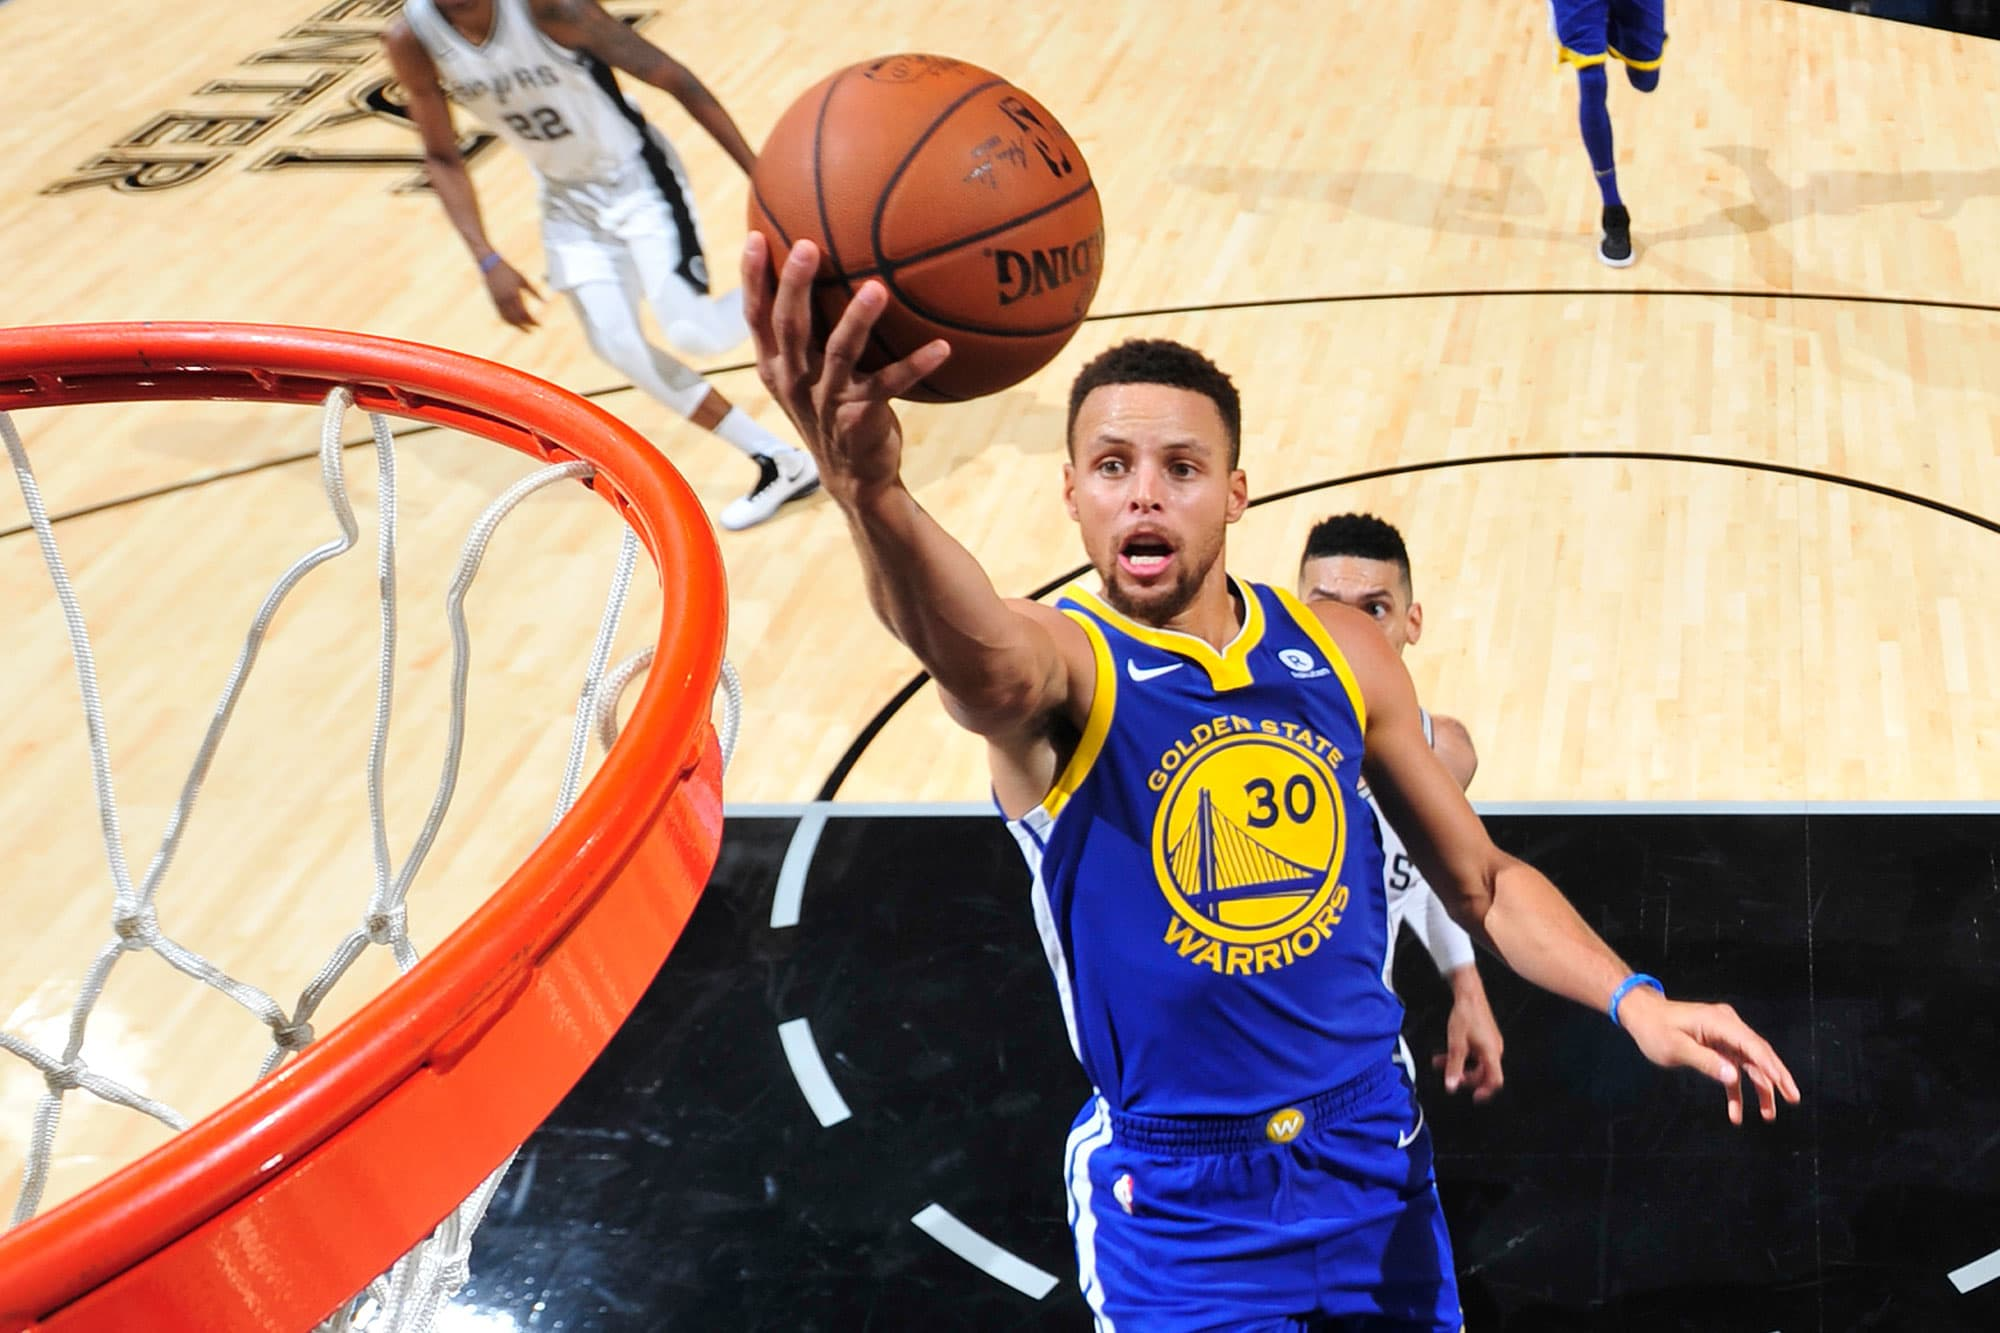 NBA targets July 31 to resume season, source says - CNBC